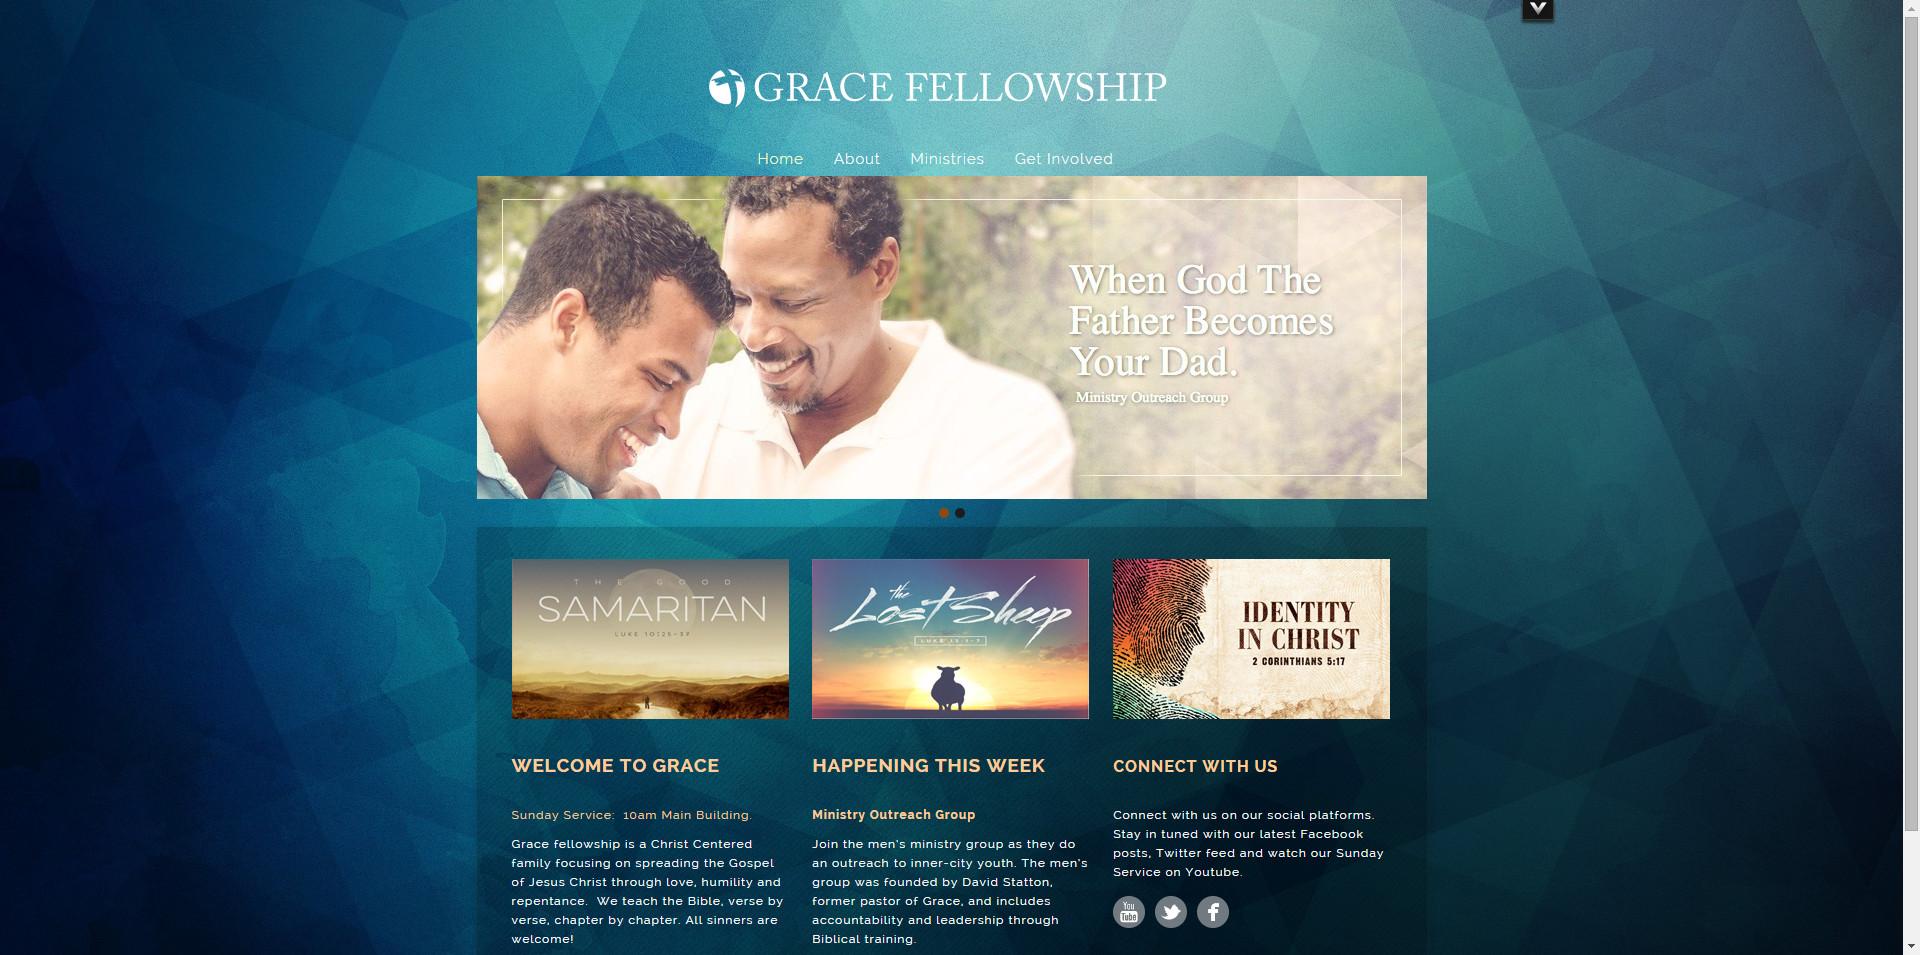 Church Website Design Examples